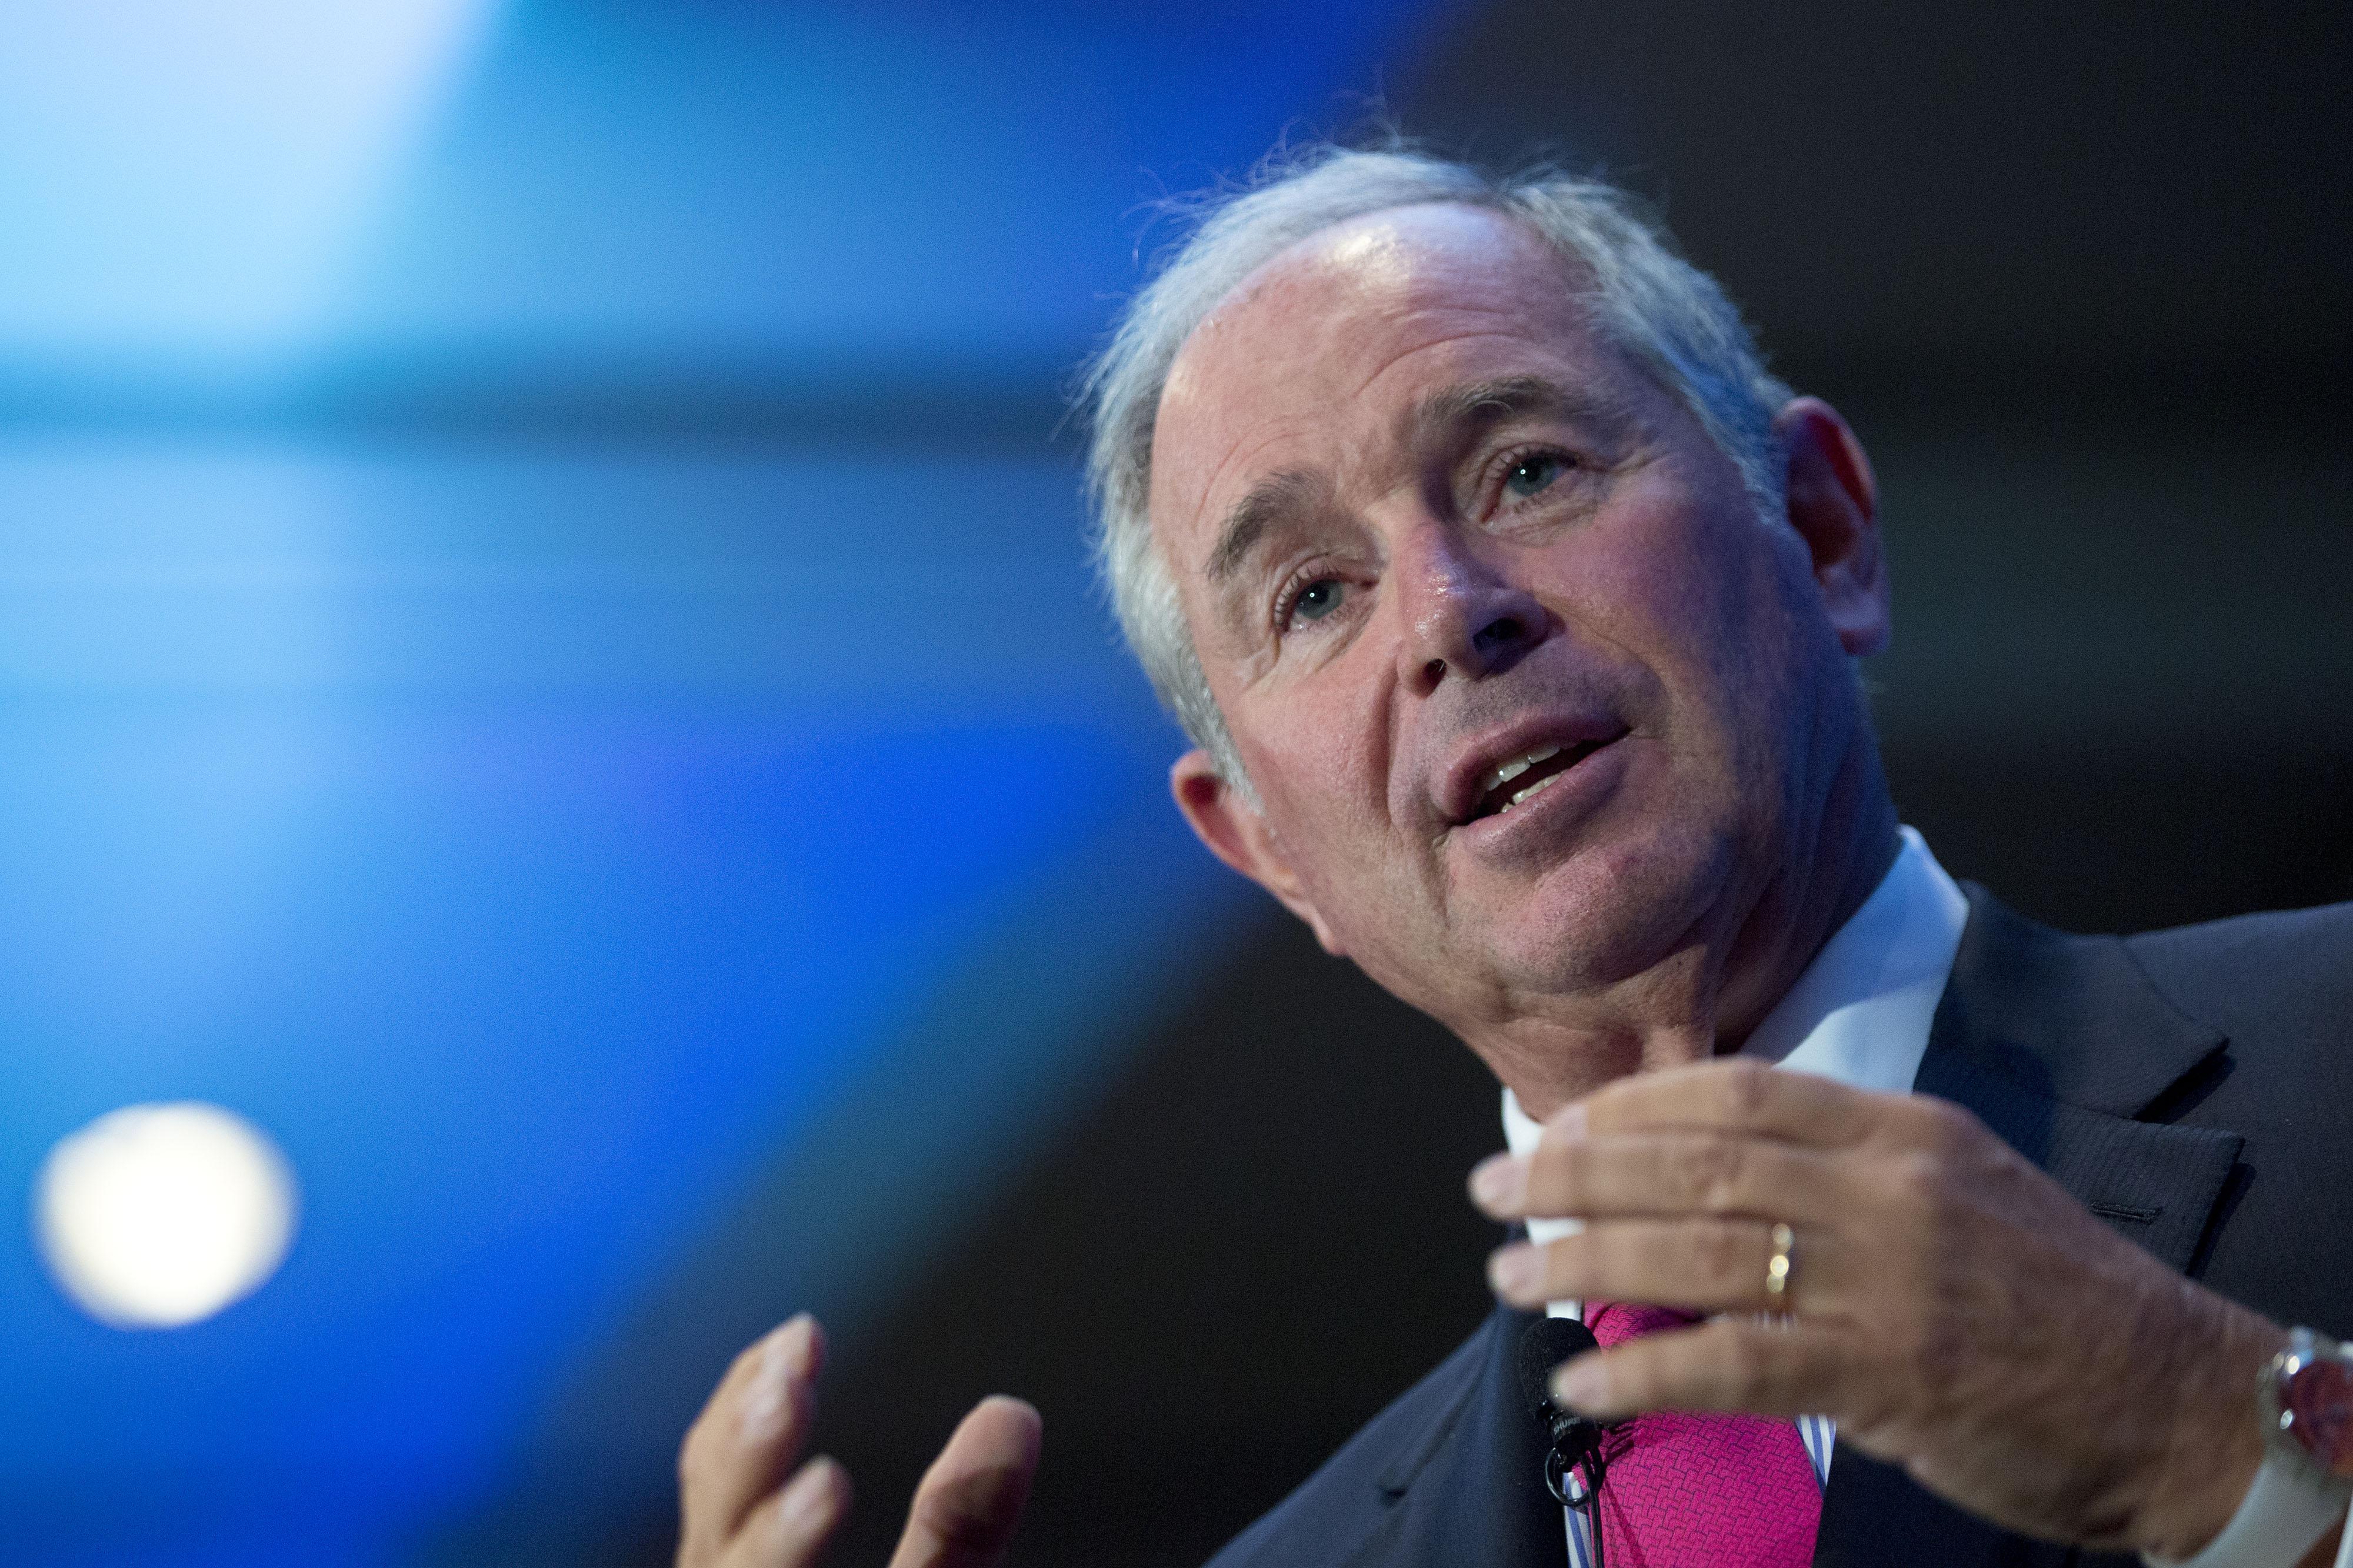 Blackstone Group Chief Executive Officer Stephen Schwarzman Speaks To Economic Club Of Washington